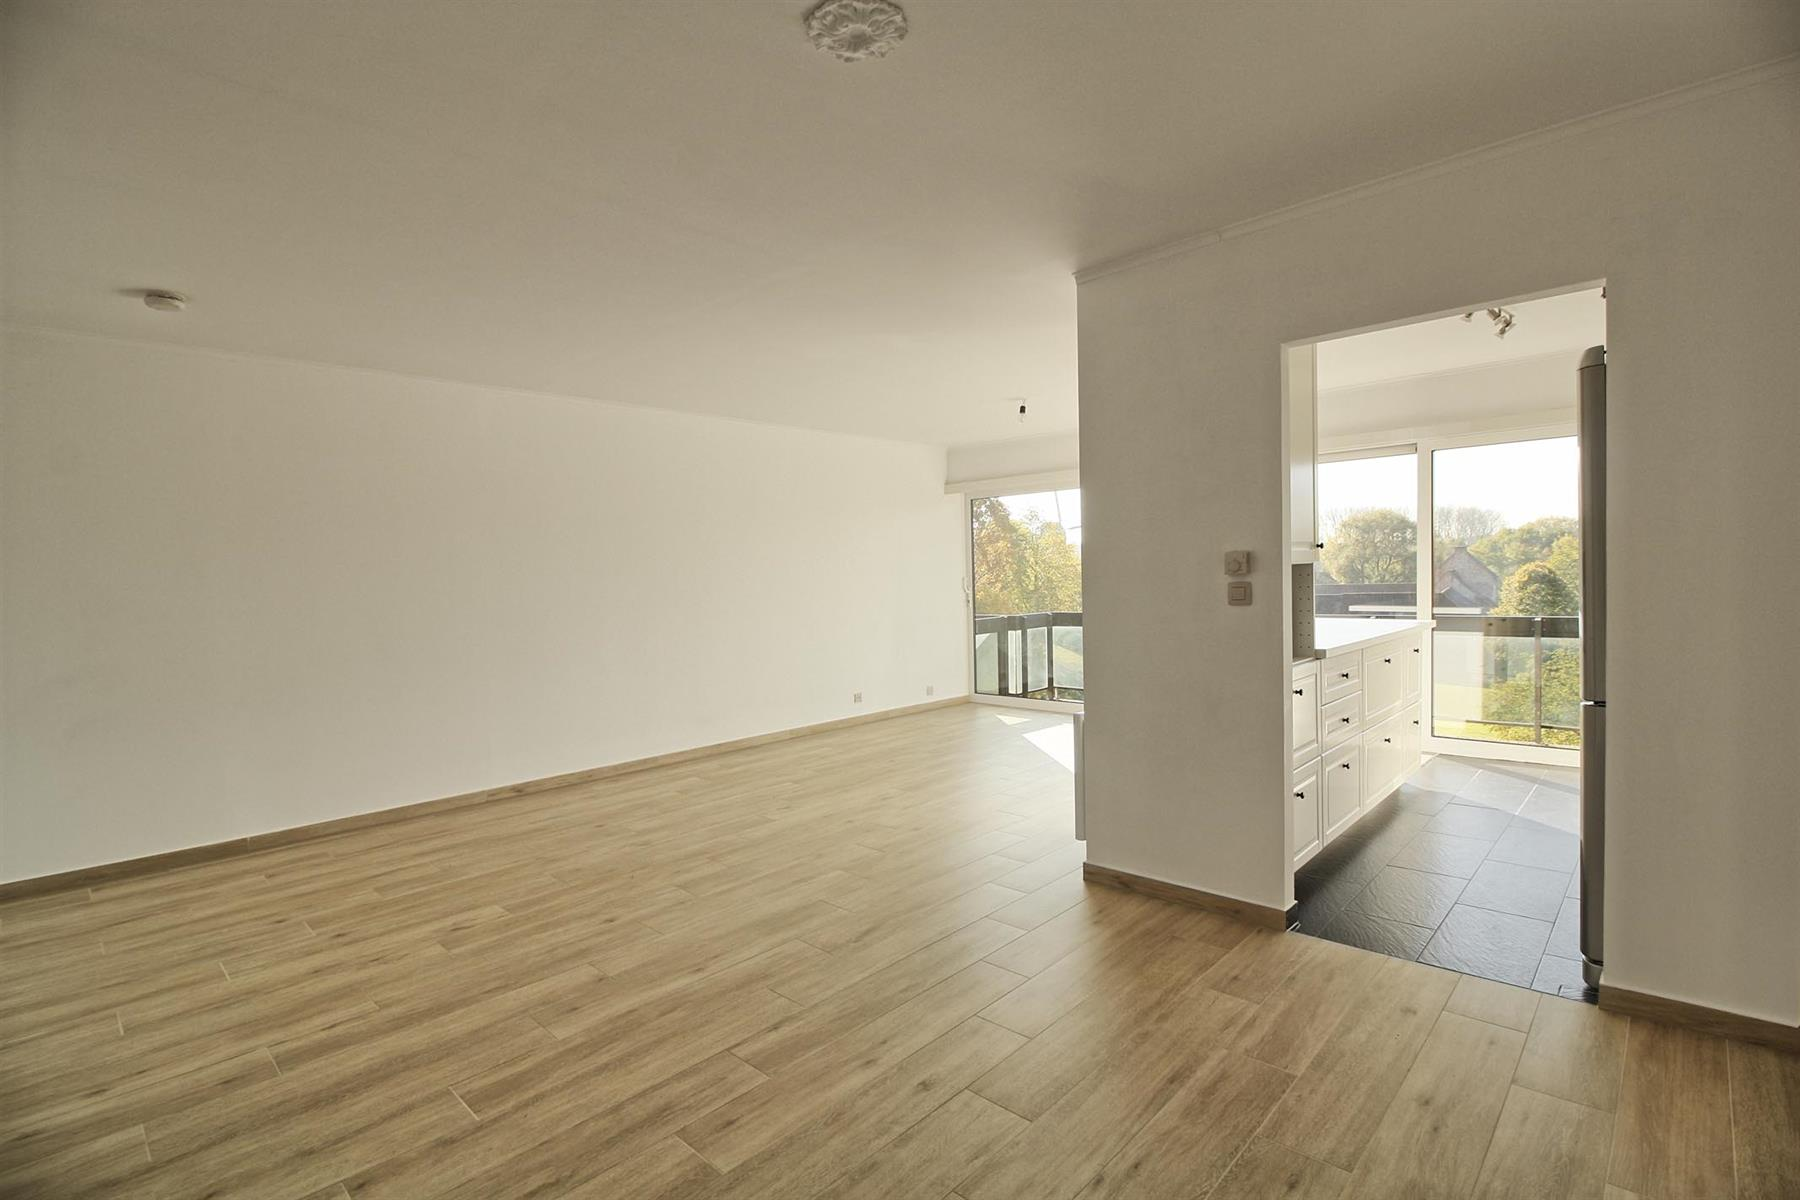 Appartement - Woluwe-Saint-Lambert - #4237926-3